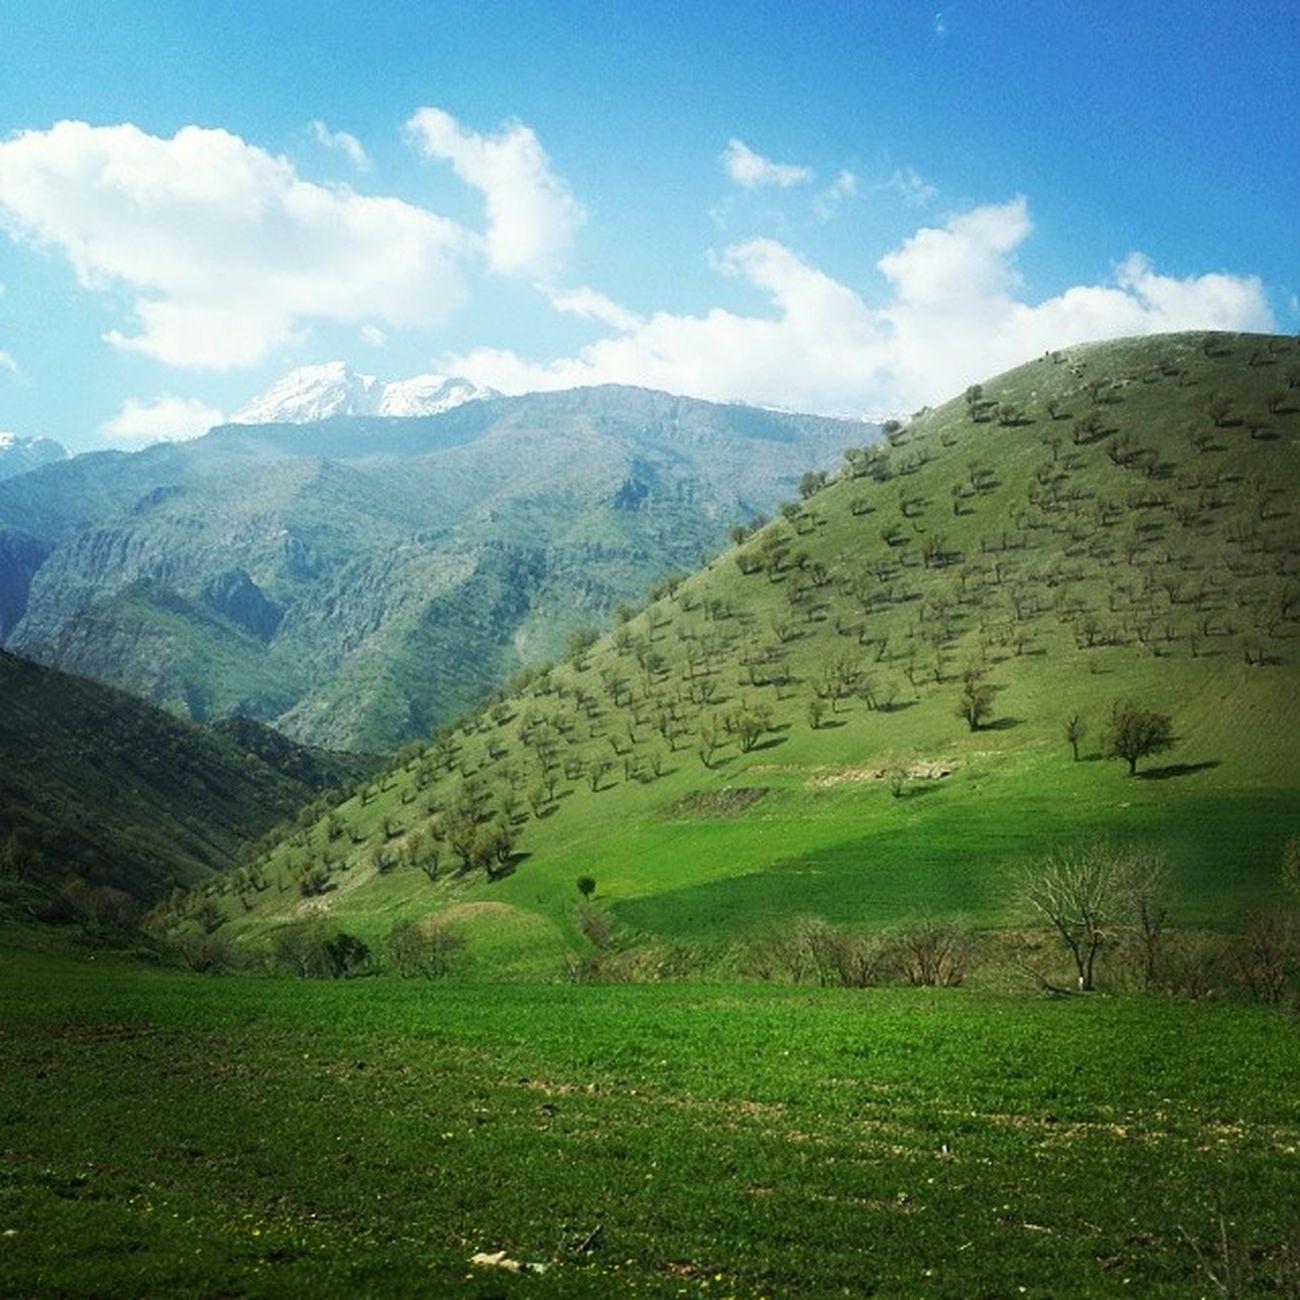 Firstdayofspring Kurdistanregion Kurdistan Mountain Spring Happynewroz Kurdishinsta Instaspring Newroz Hawler Erbil